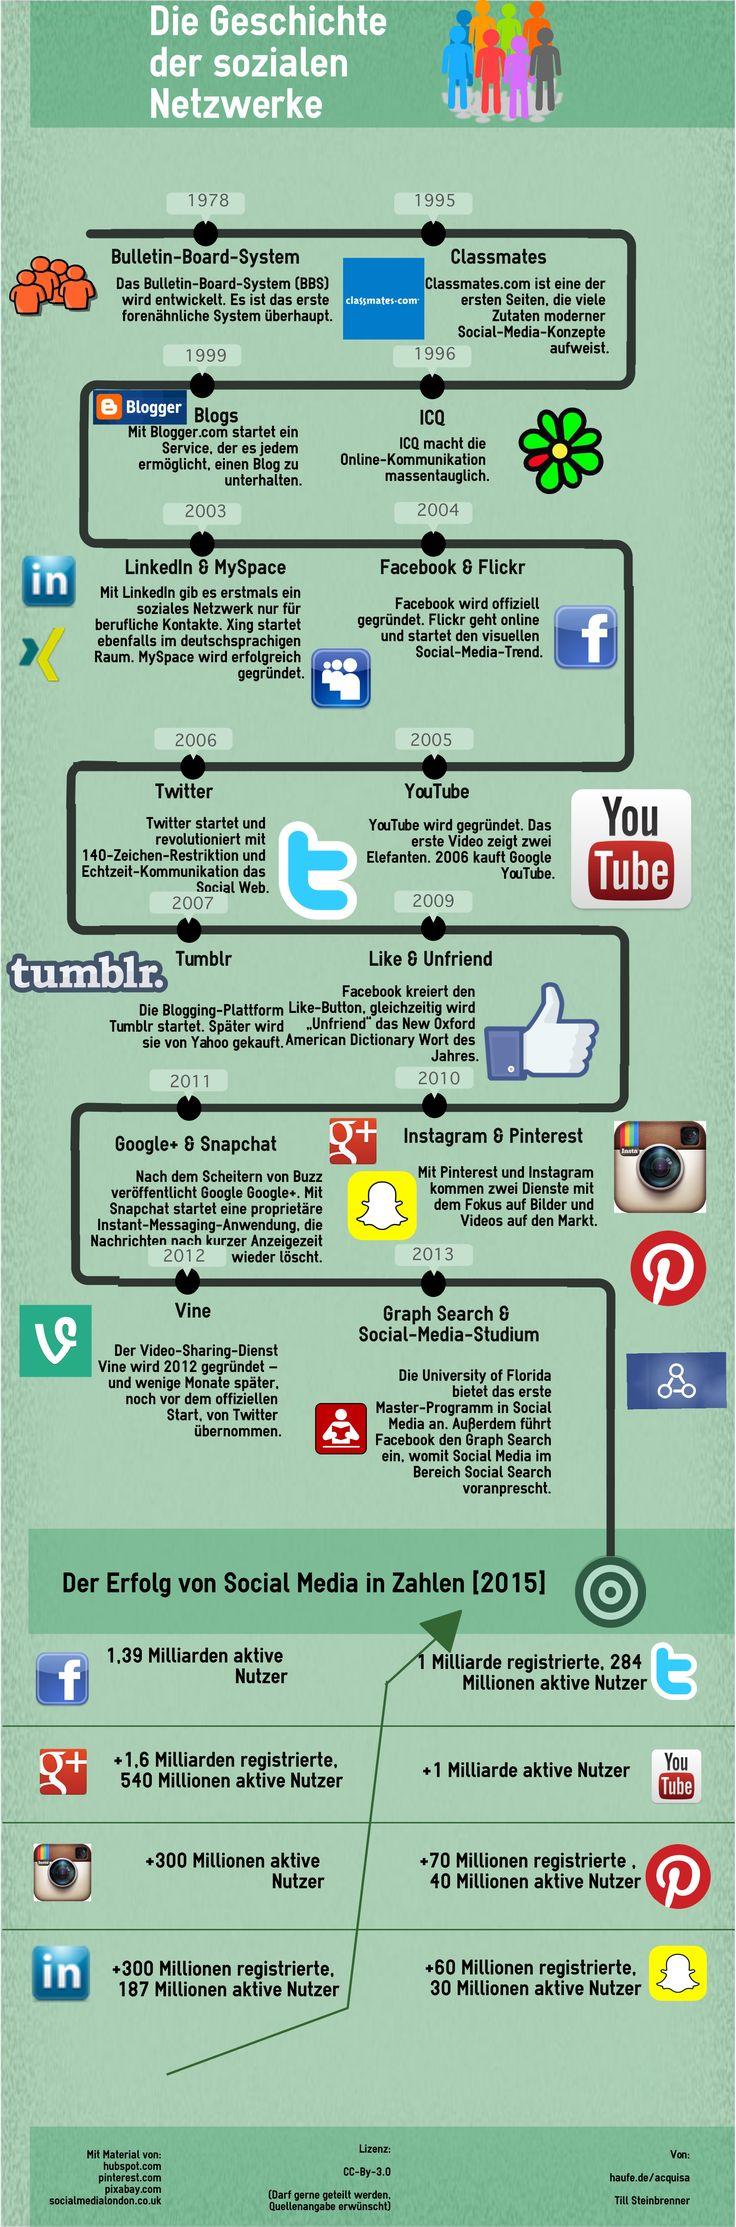 Die Social-Media-Geschichte: Vom Bulletin-Board-System 1978 bis Snapchat & Vine | Kroker's Look @ IT  http://blog.wiwo.de/look-at-it/2015/11/16/die-social-media-geschichte-vom-bulletin-board-system-1978-bis-snapchat-vine/